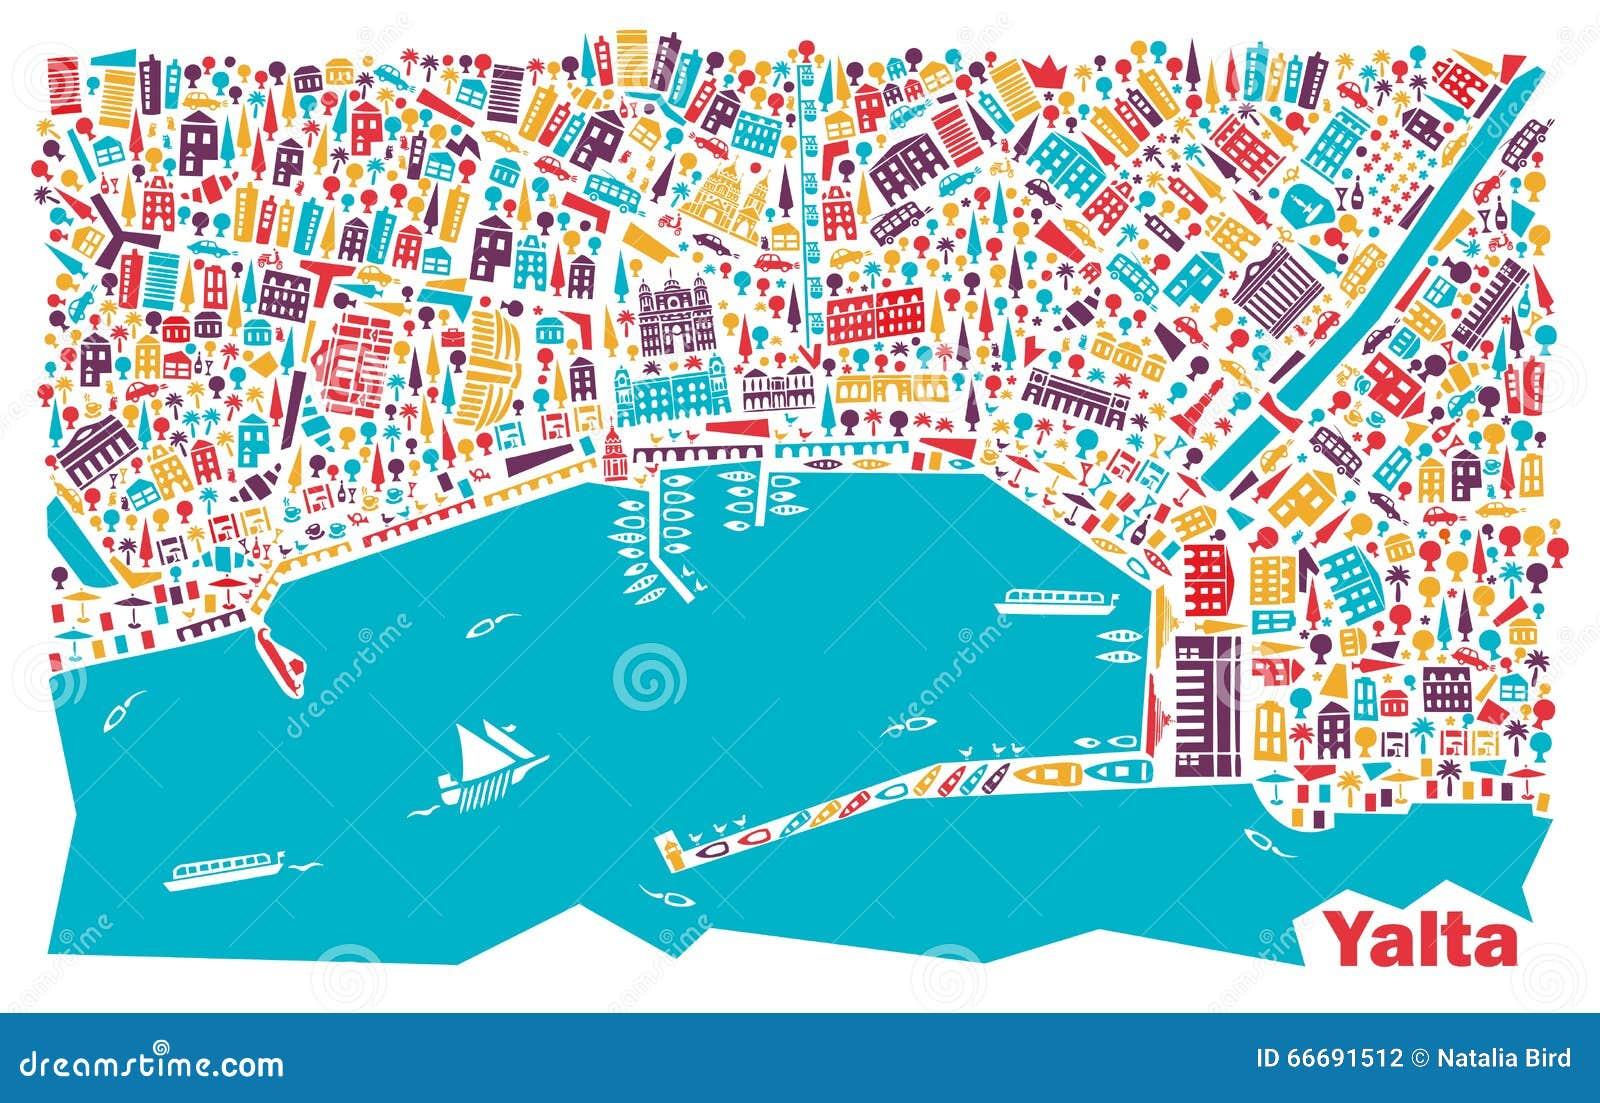 Yalta Map on antwerp map, leningrad map, hiroshima map, crimea map, yalta conference, stalingrad map, yusupov palace, gdansk map, sochi map, livadia palace, mukacheve map, nuremberg map, anapa map, casablanca map, vorontsov palace, vichy map, crimean peninsula map, riga map, tehran map, black sea map, ukraine map, sea of azov, donetsk map, berlin map, caucasus mountains map,